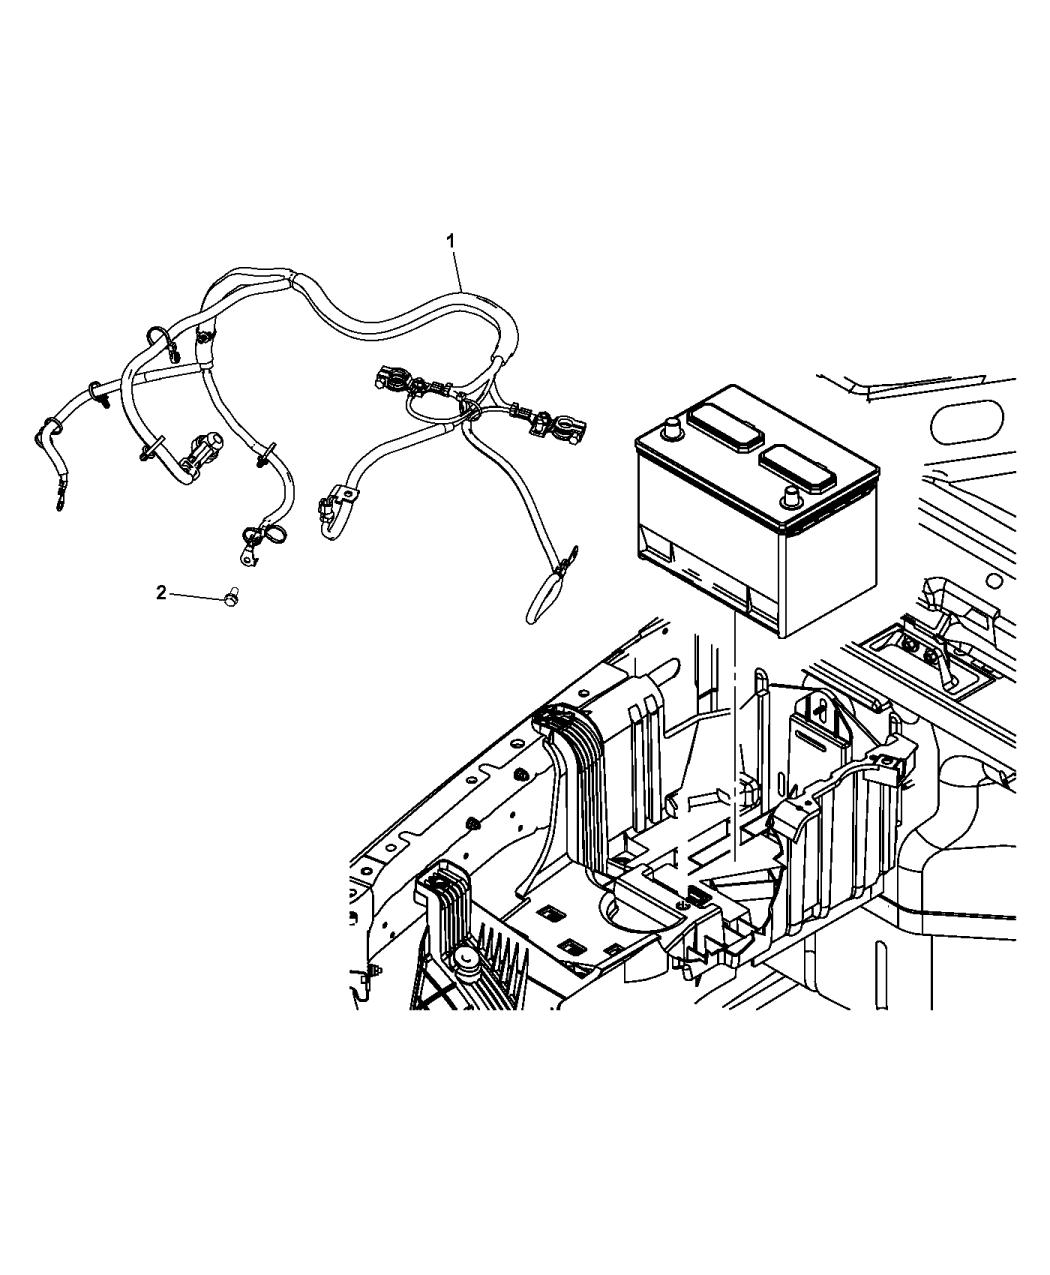 2015 Jeep Wrangler Battery Wiring - Mopar Parts Giant